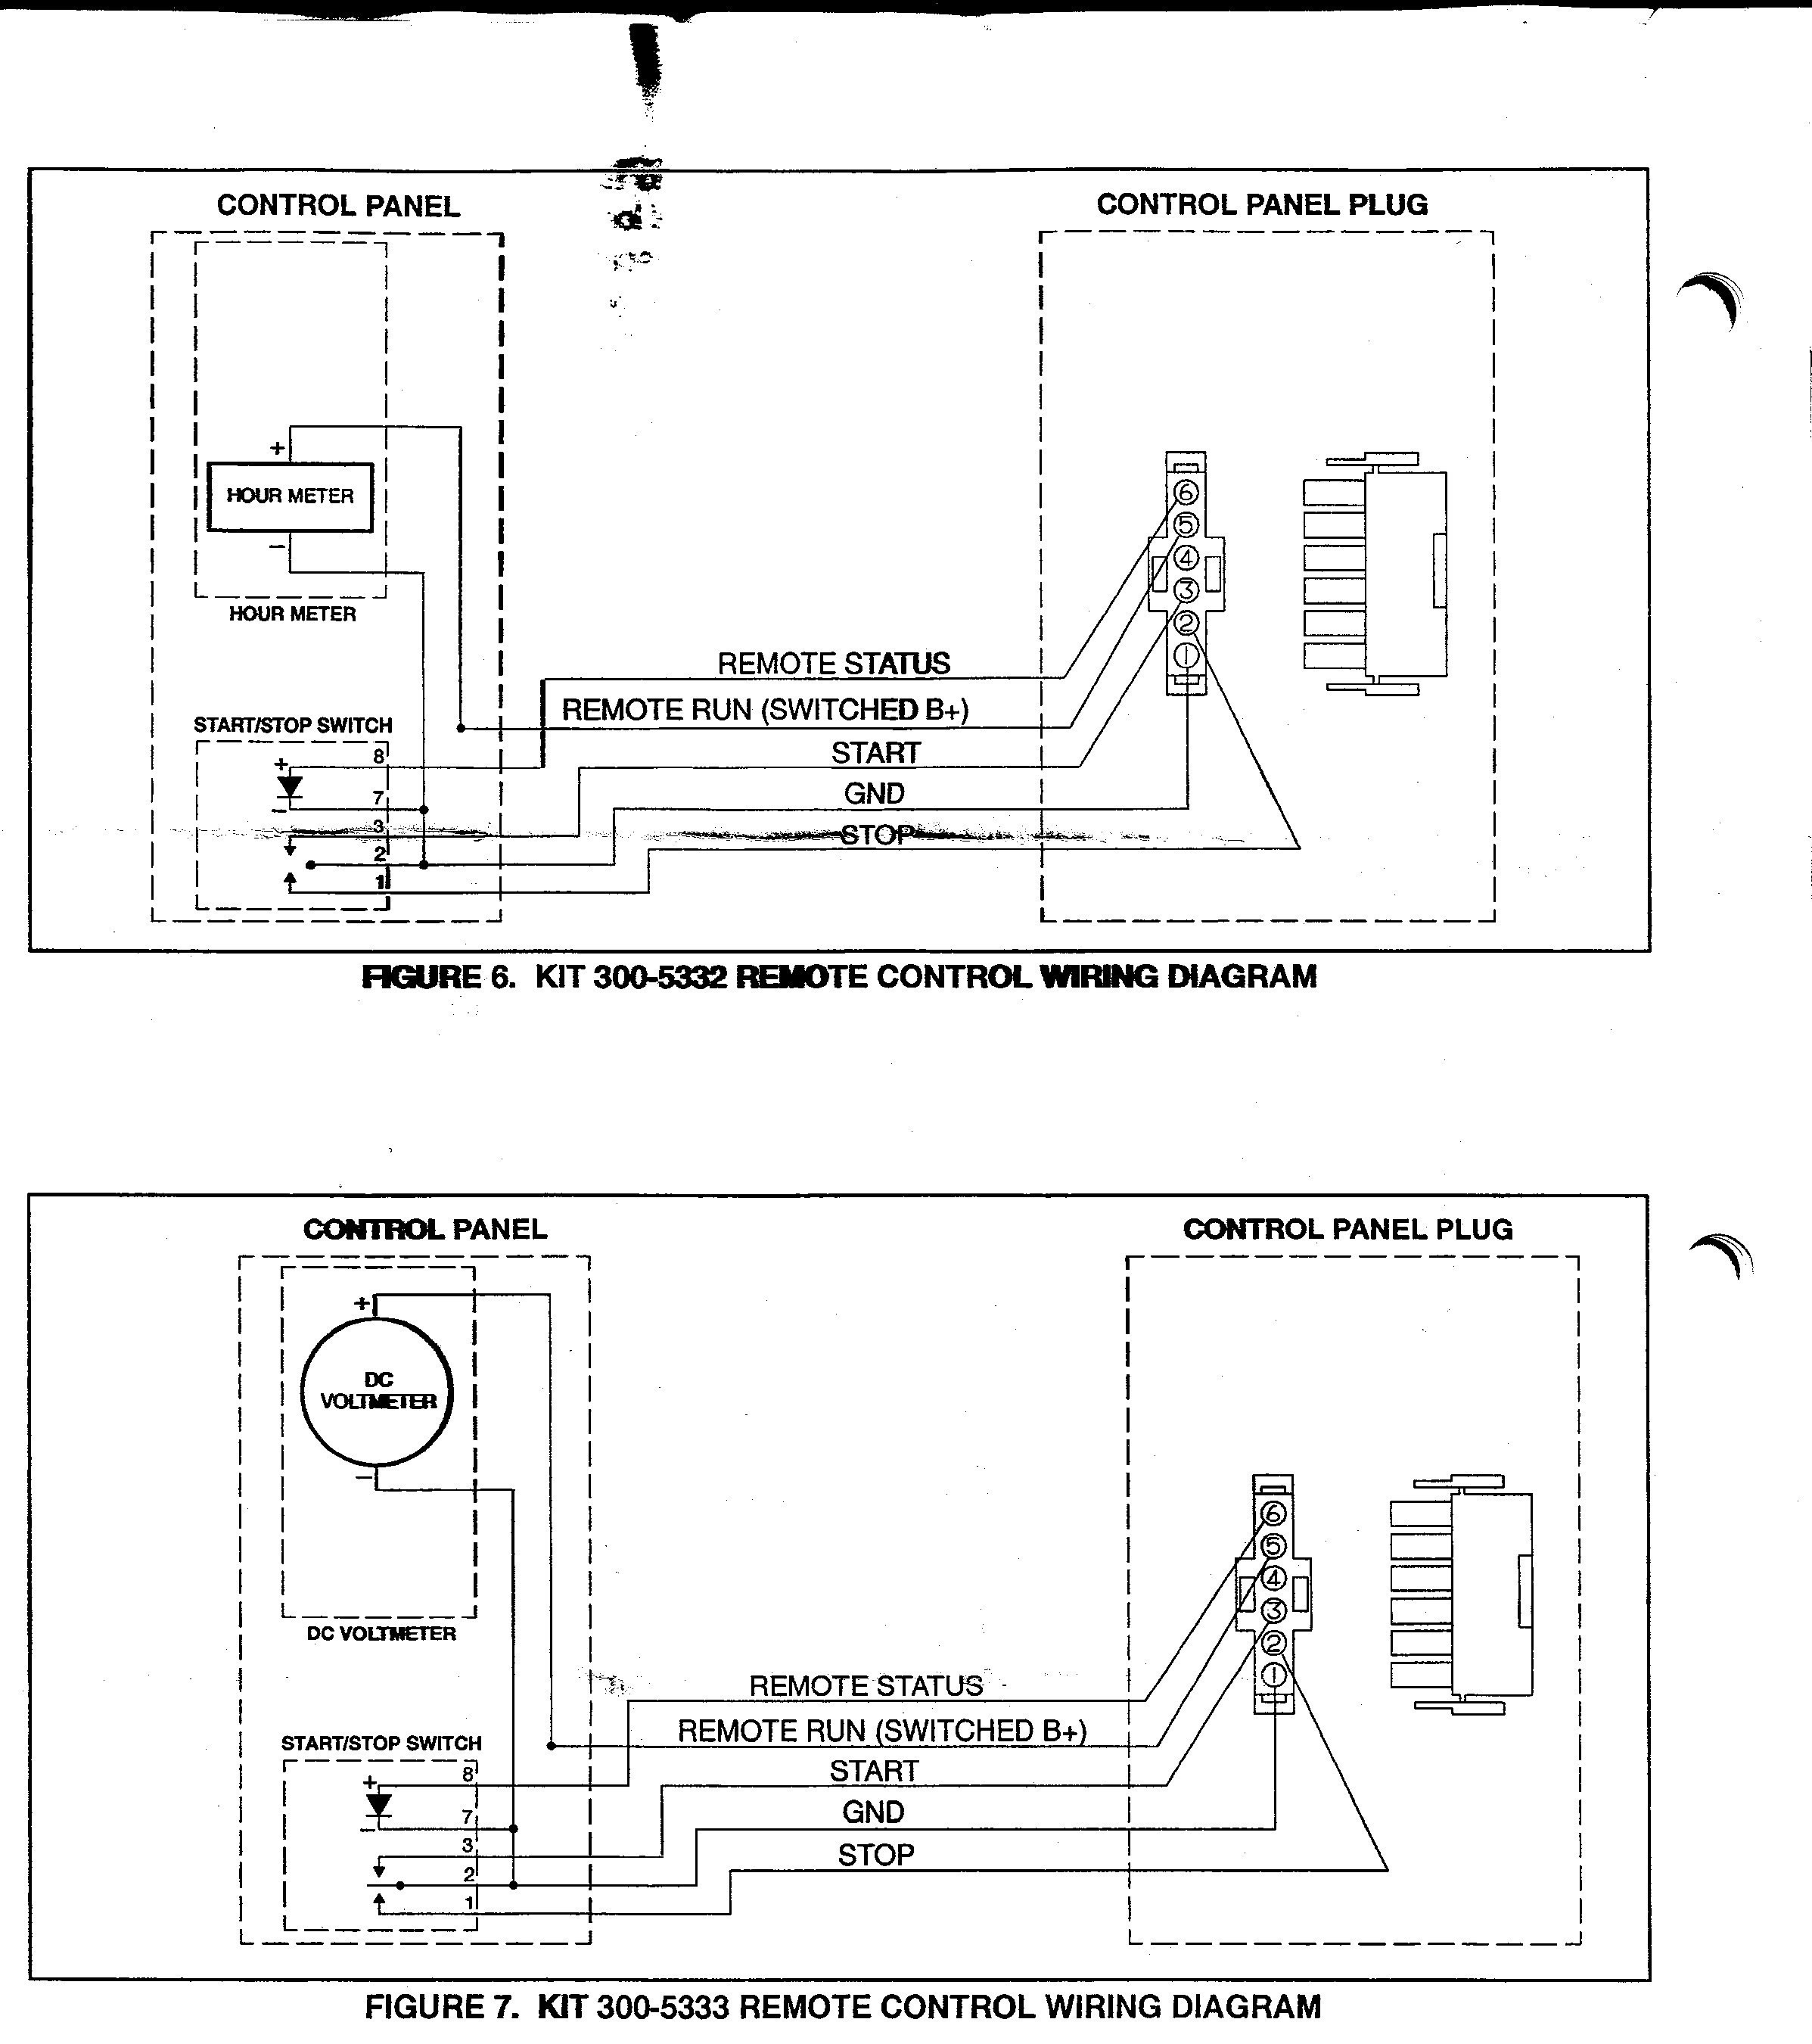 Onan Generator Wire Diagram Wiring Diagram An Generator New An Generator Remote Start Wiring Of Onan Generator Wire Diagram